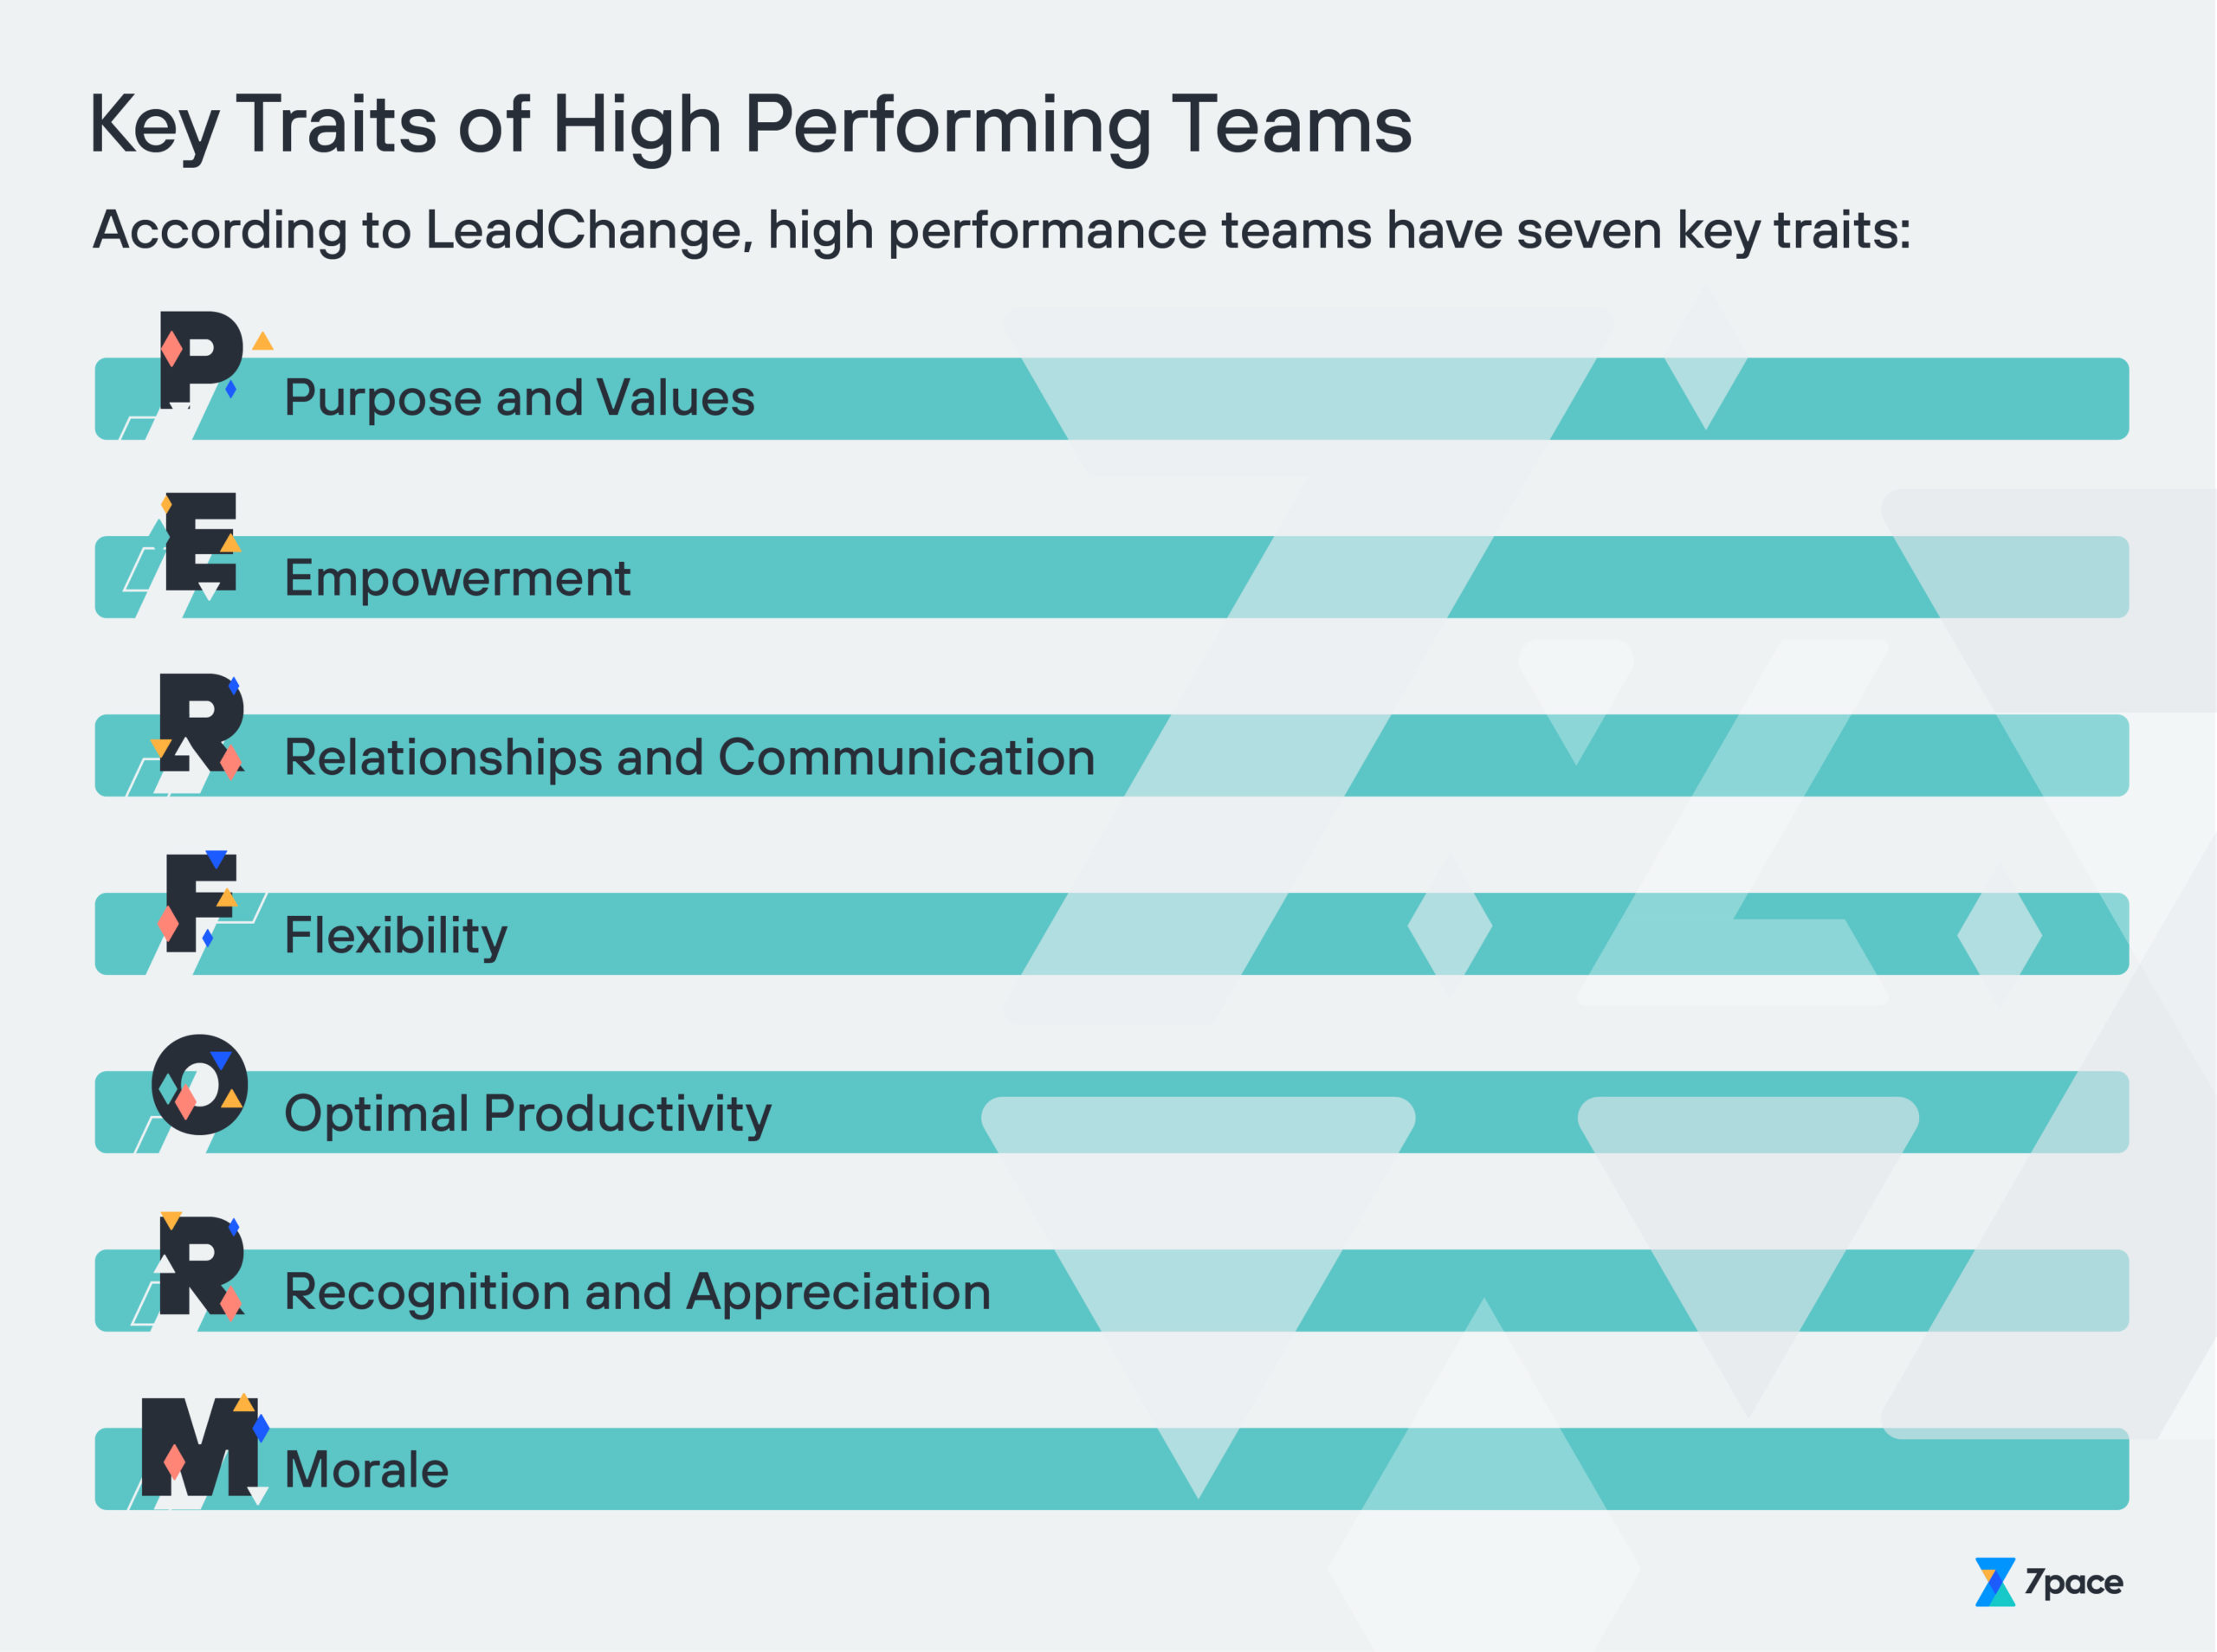 Key Traits of High Performing Teams